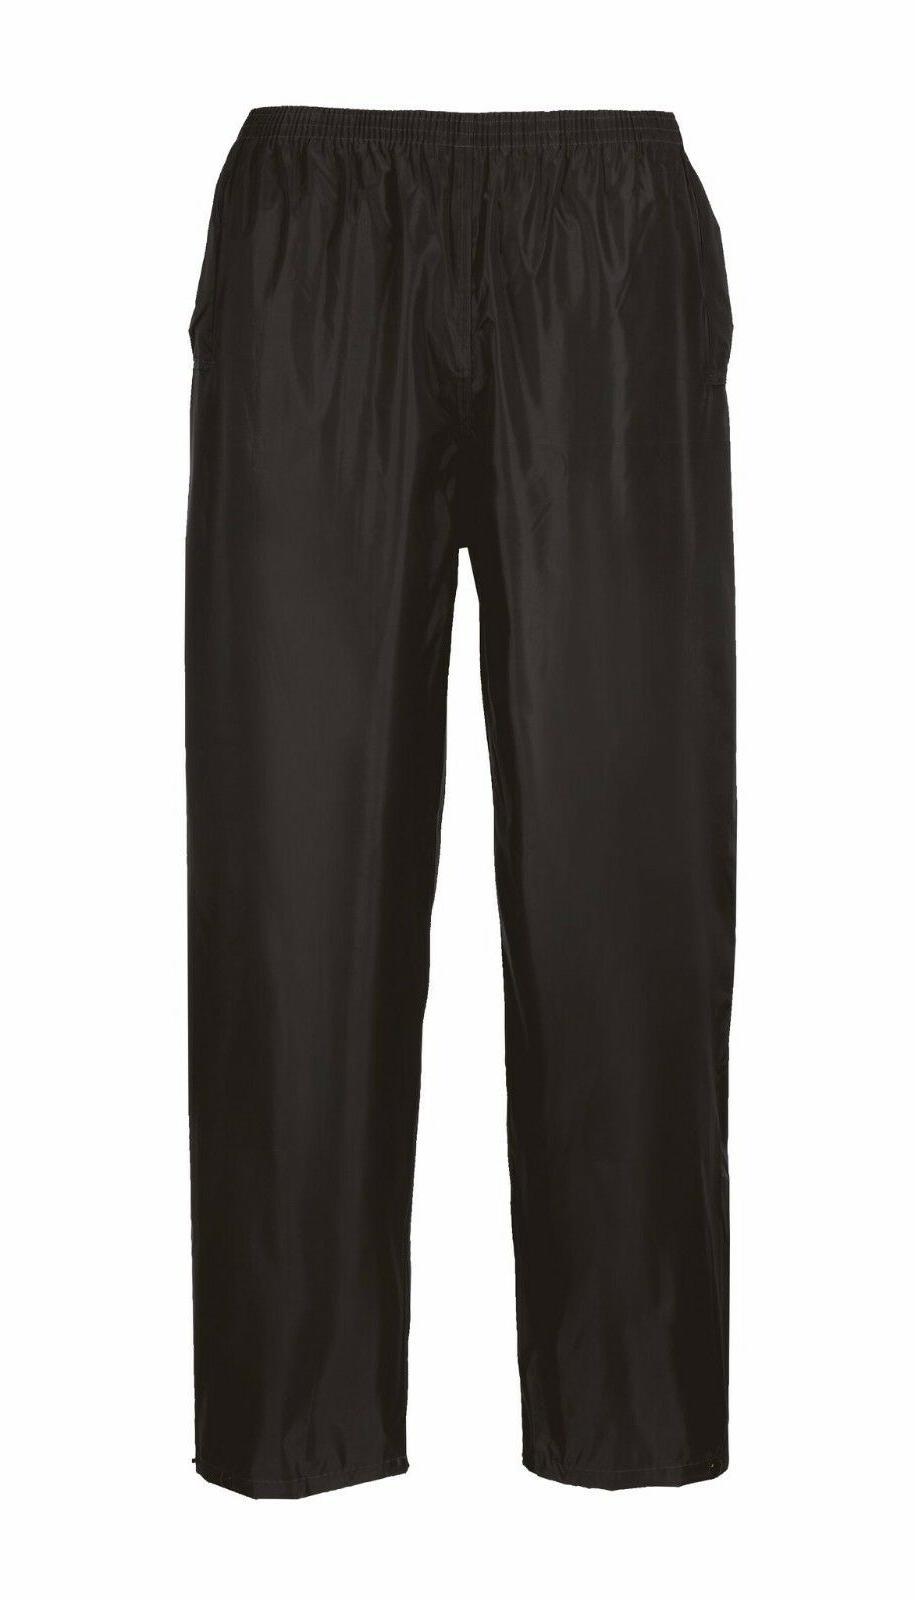 Portwest Rain Jacket Pant Black/Navy